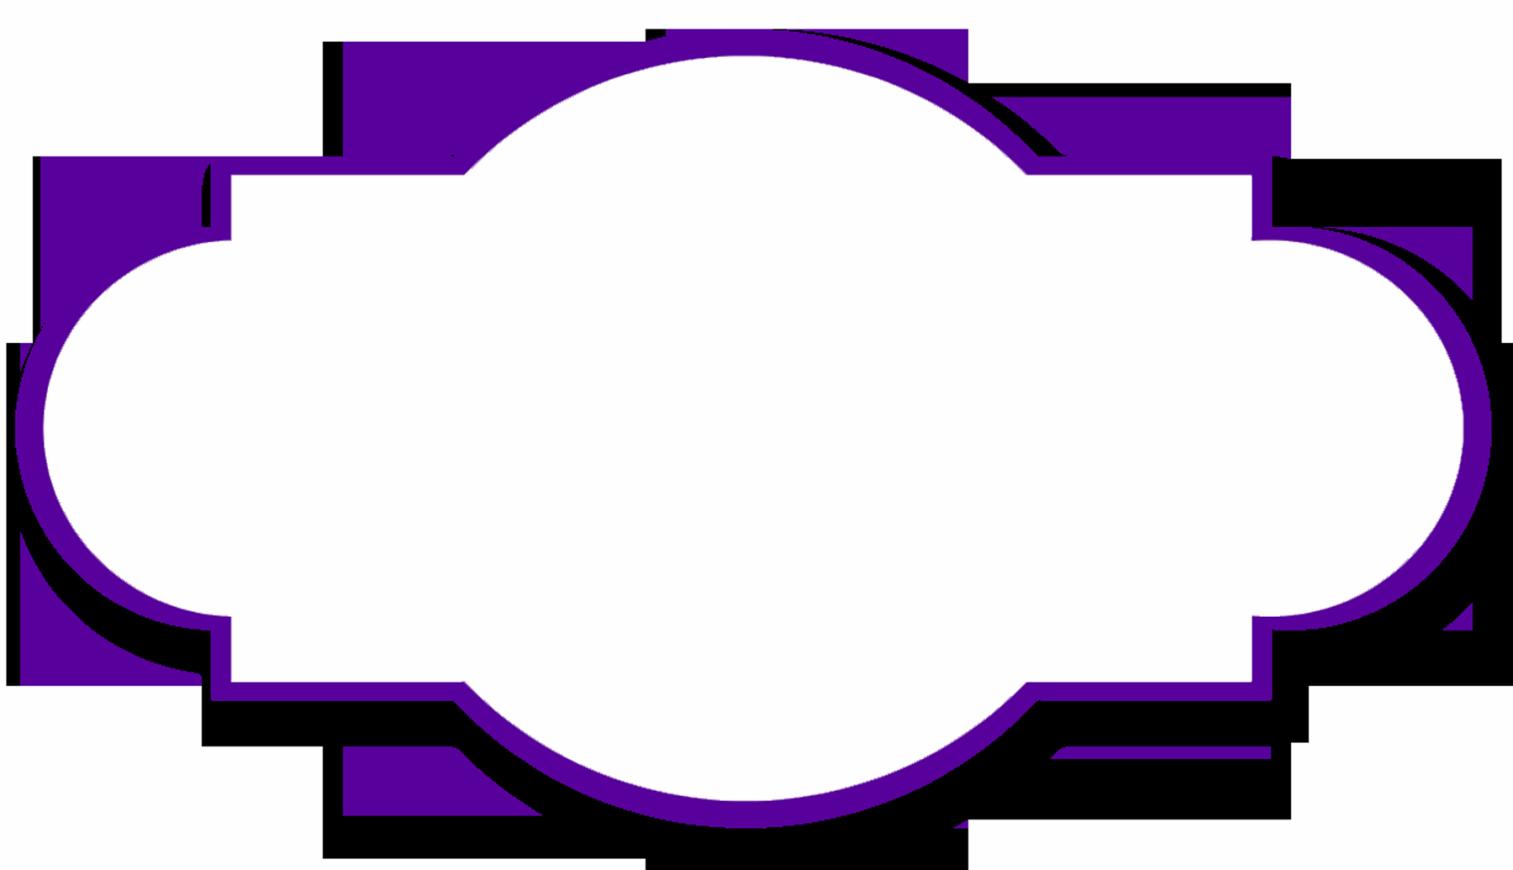 simple purple border clip art free image rh pixy org purple ribbon border clip art purple floral border clip art